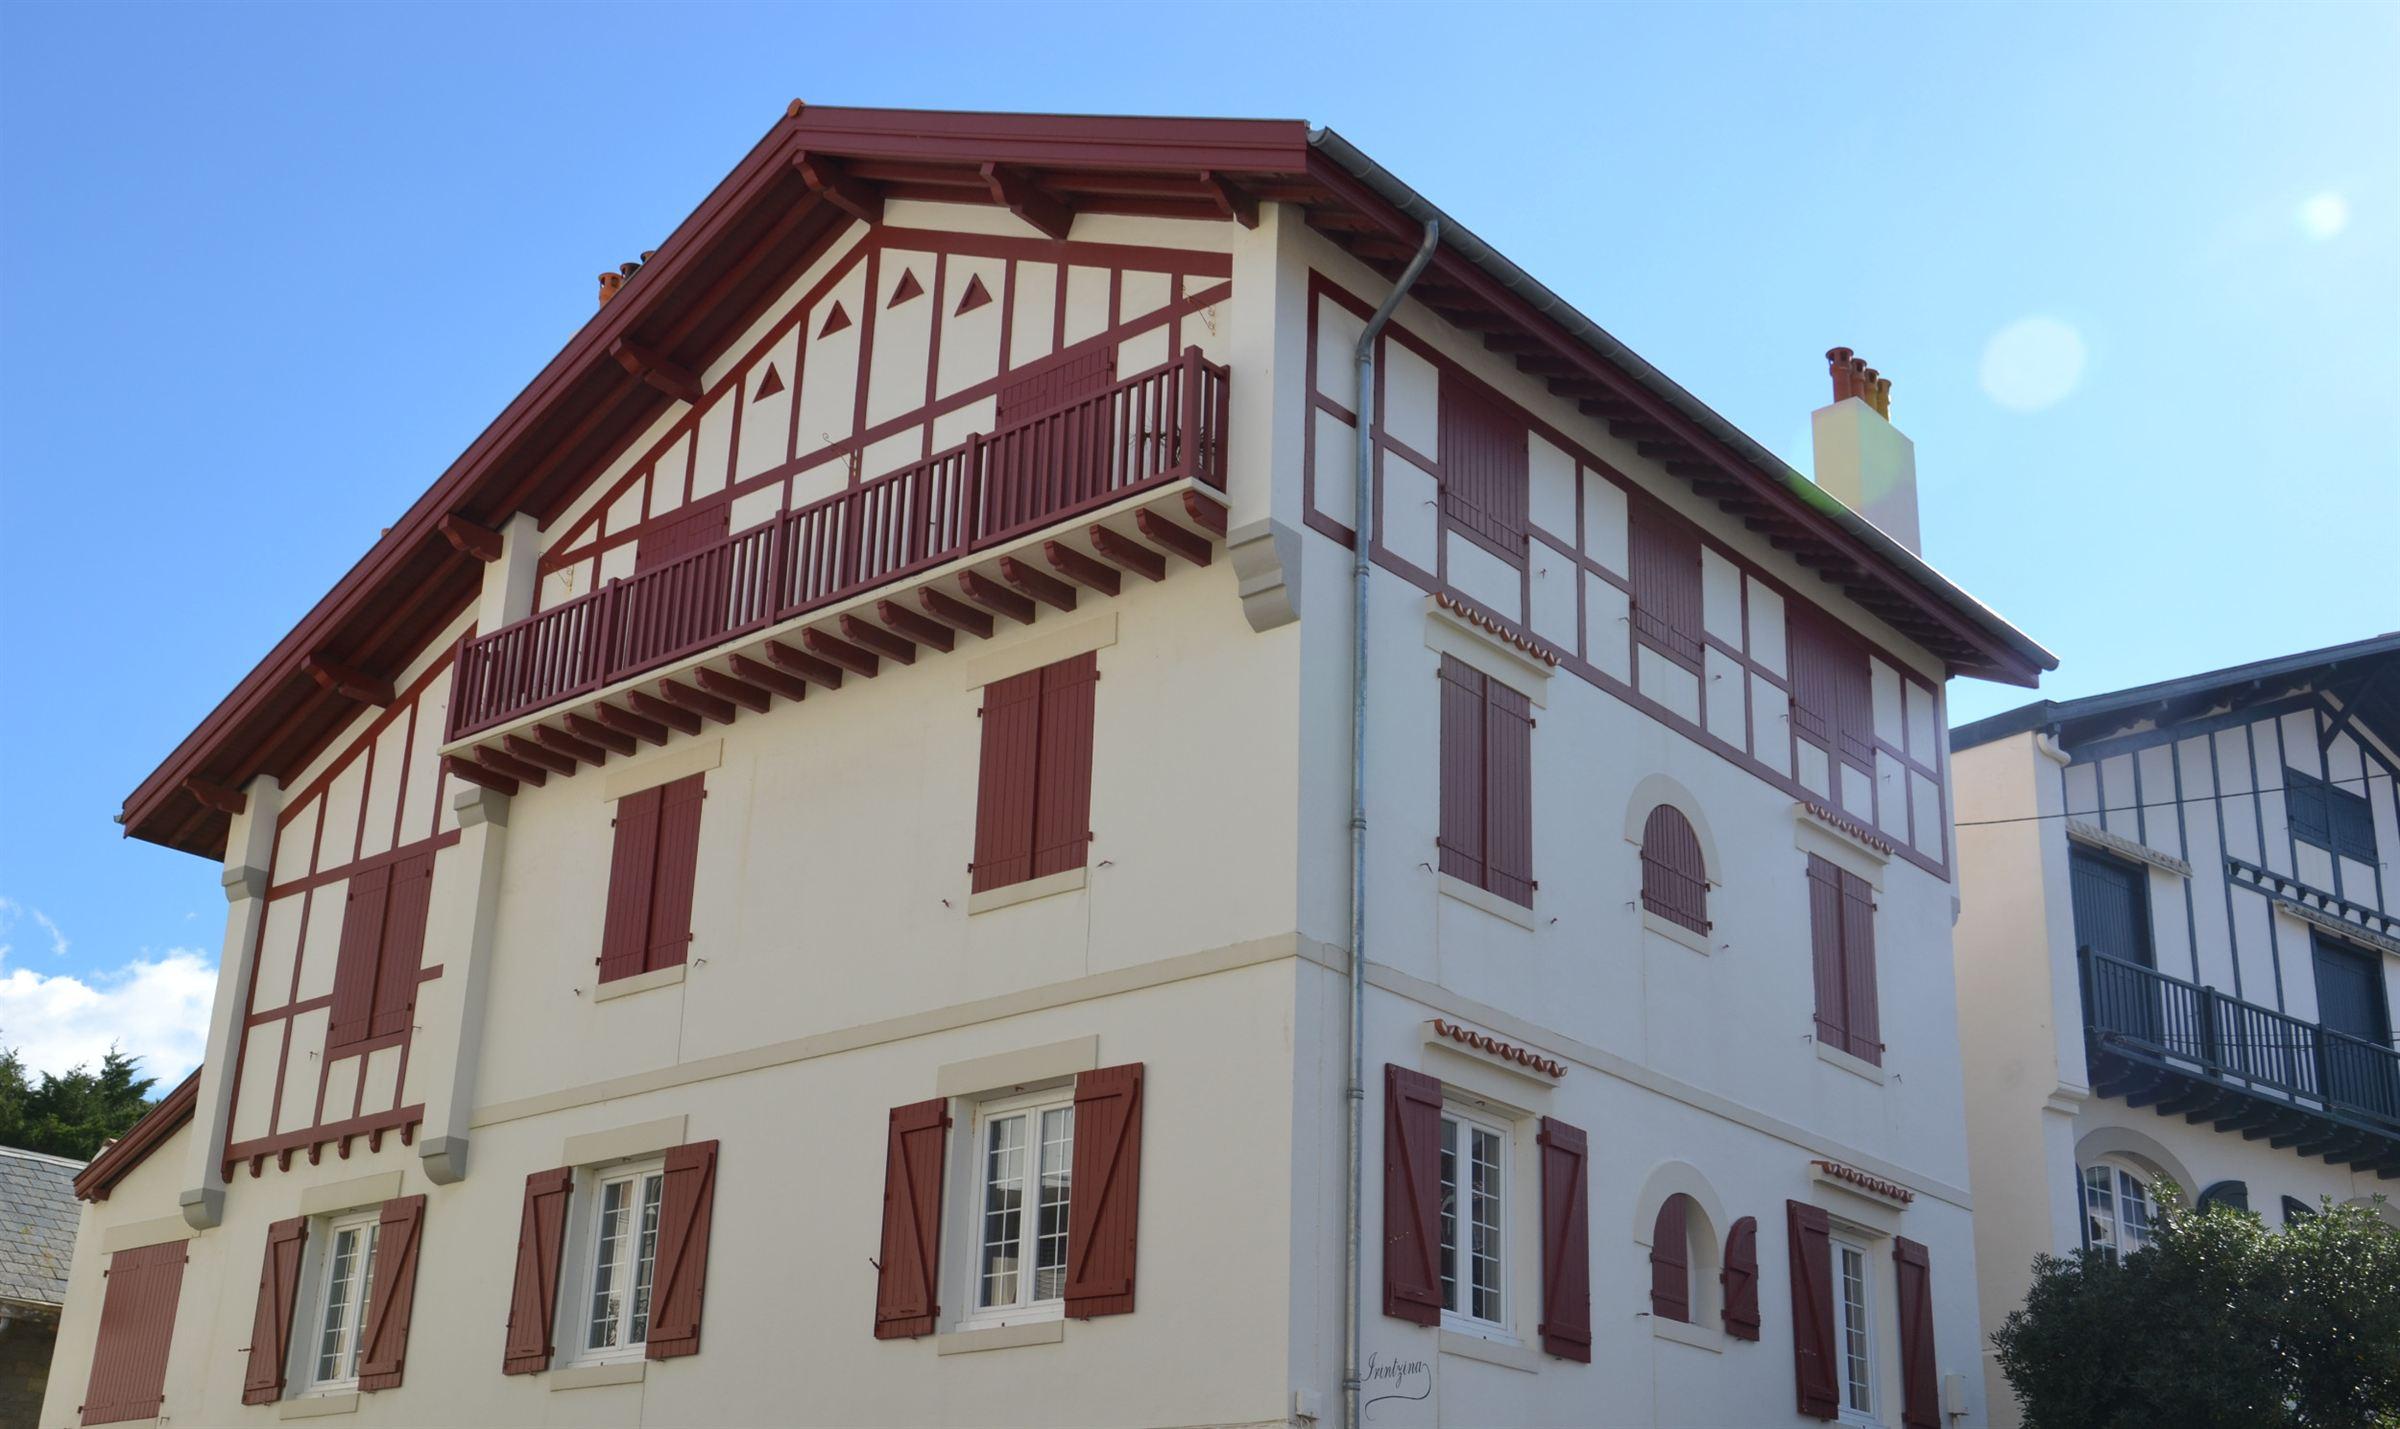 Apartment for Sale at BIARRITZ Biarritz, Aquitaine, 64200 France